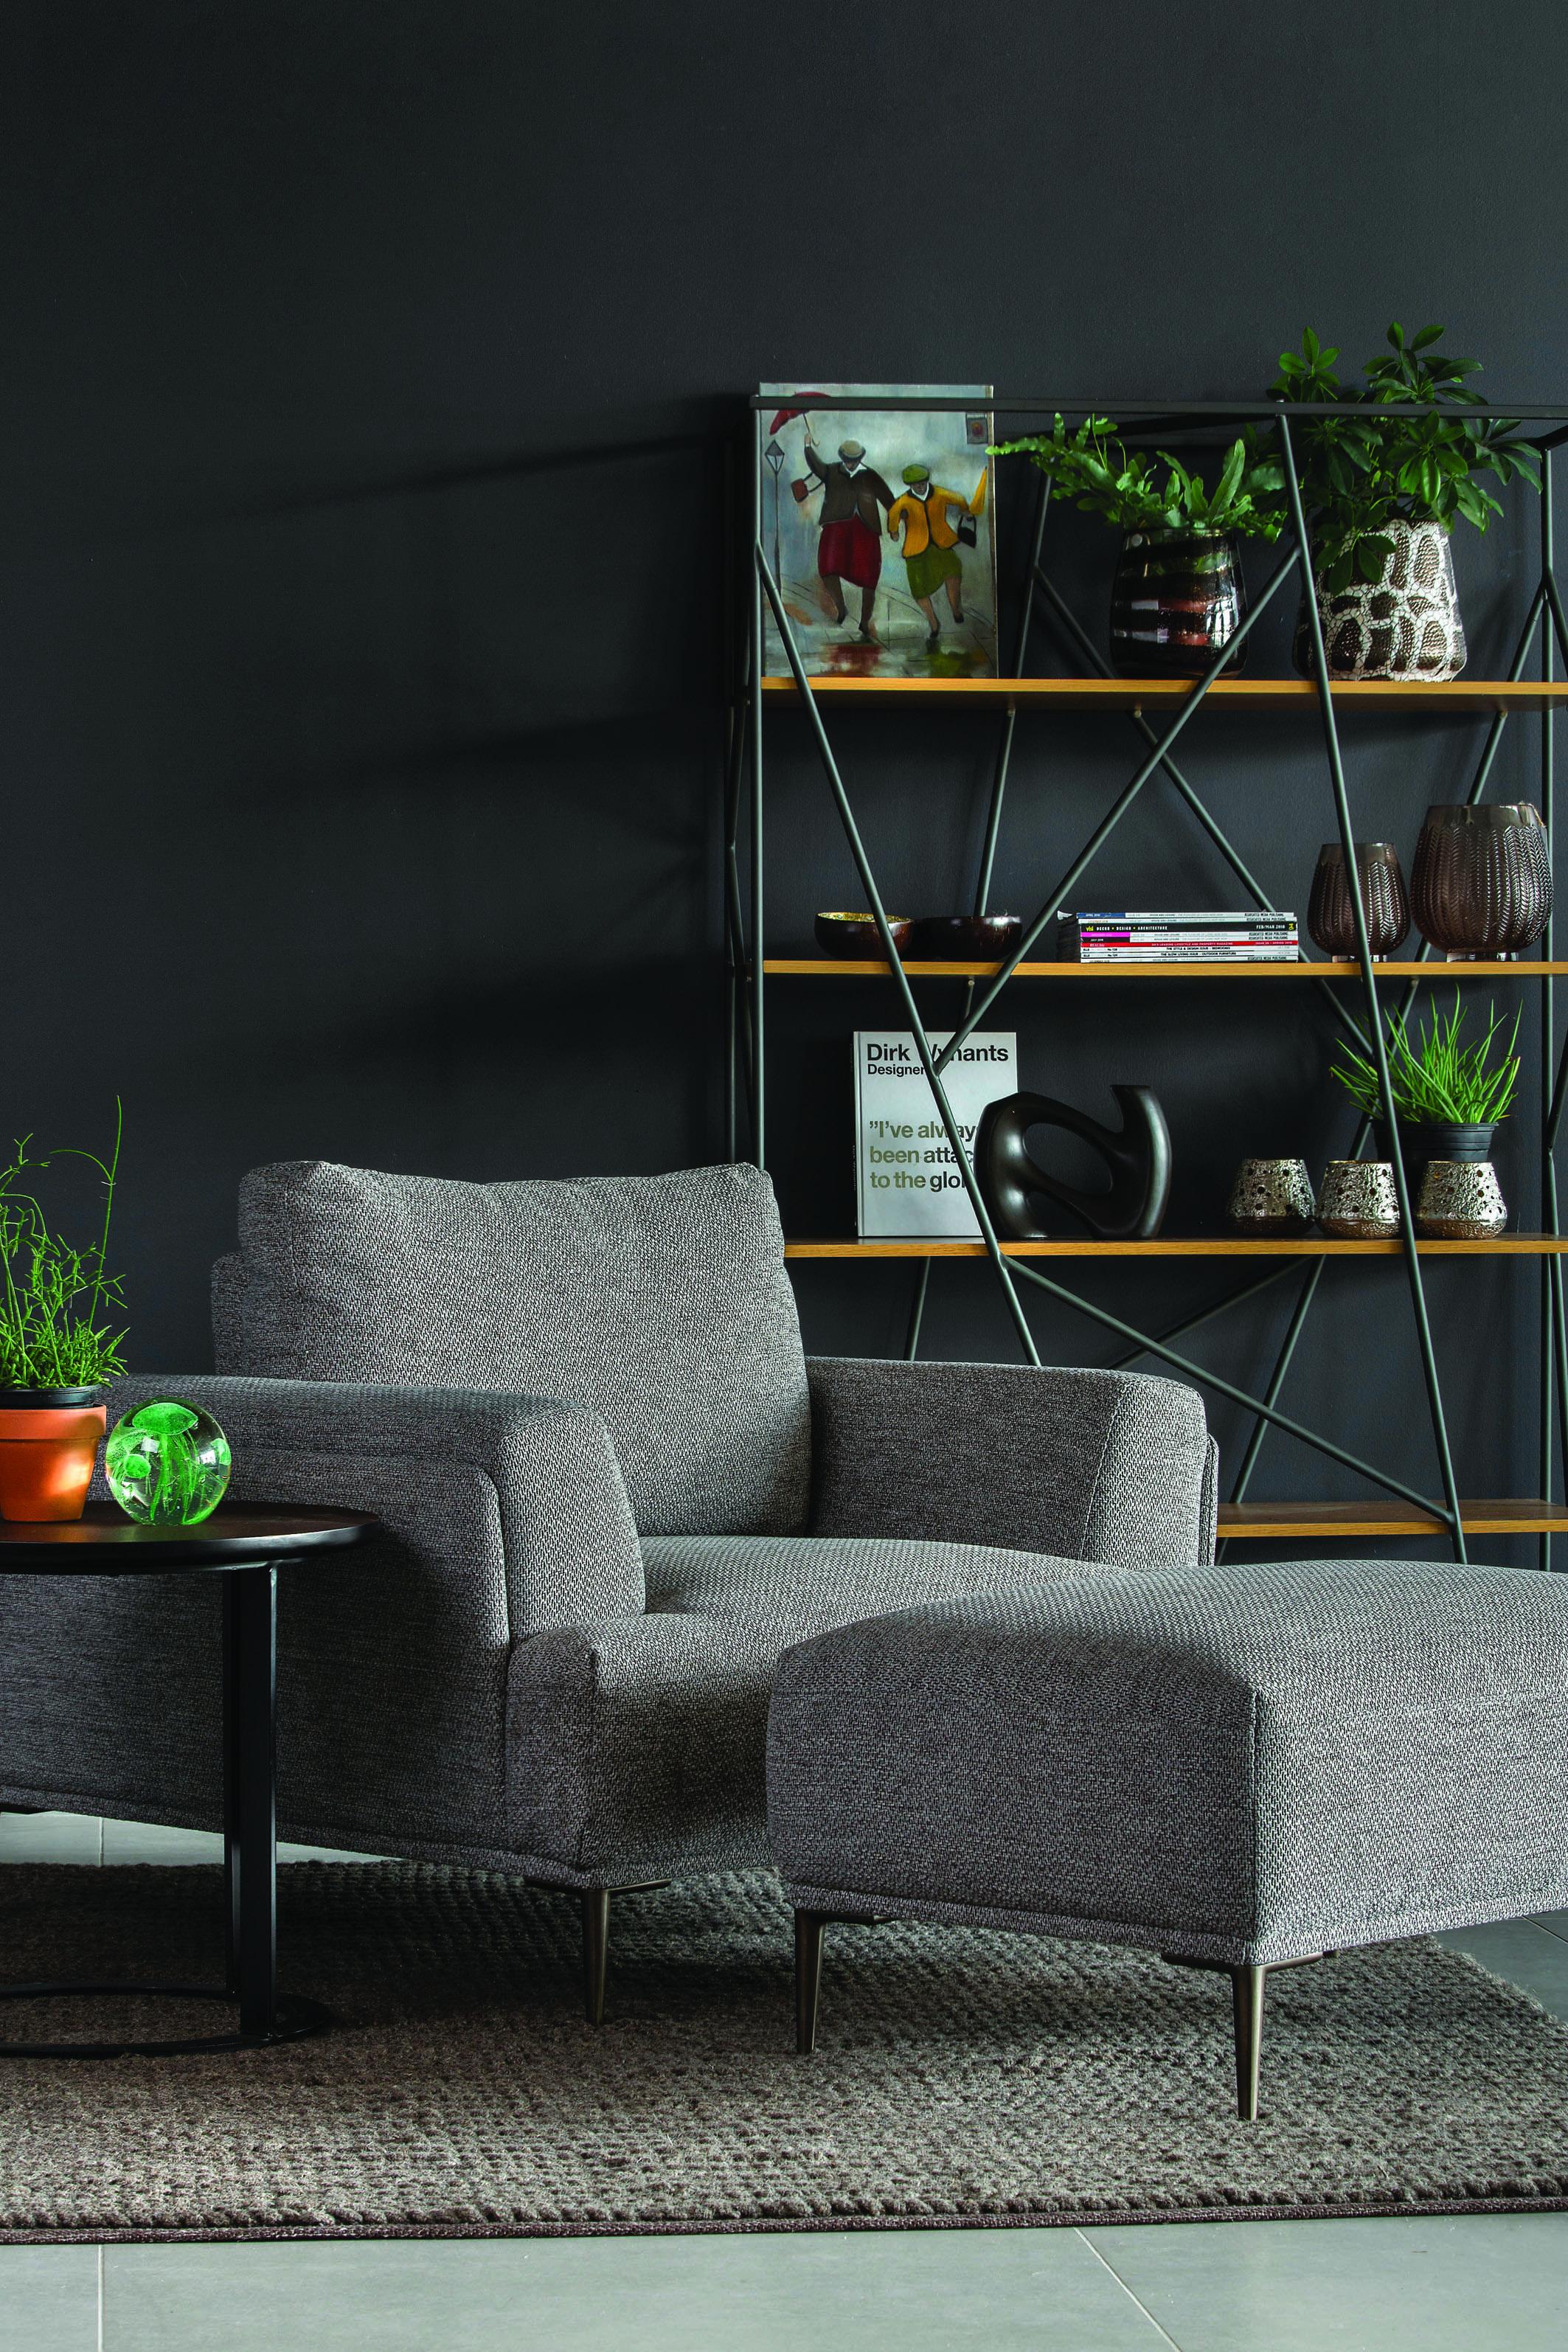 Highline Shelving Unit in 2020 Living furniture, Living